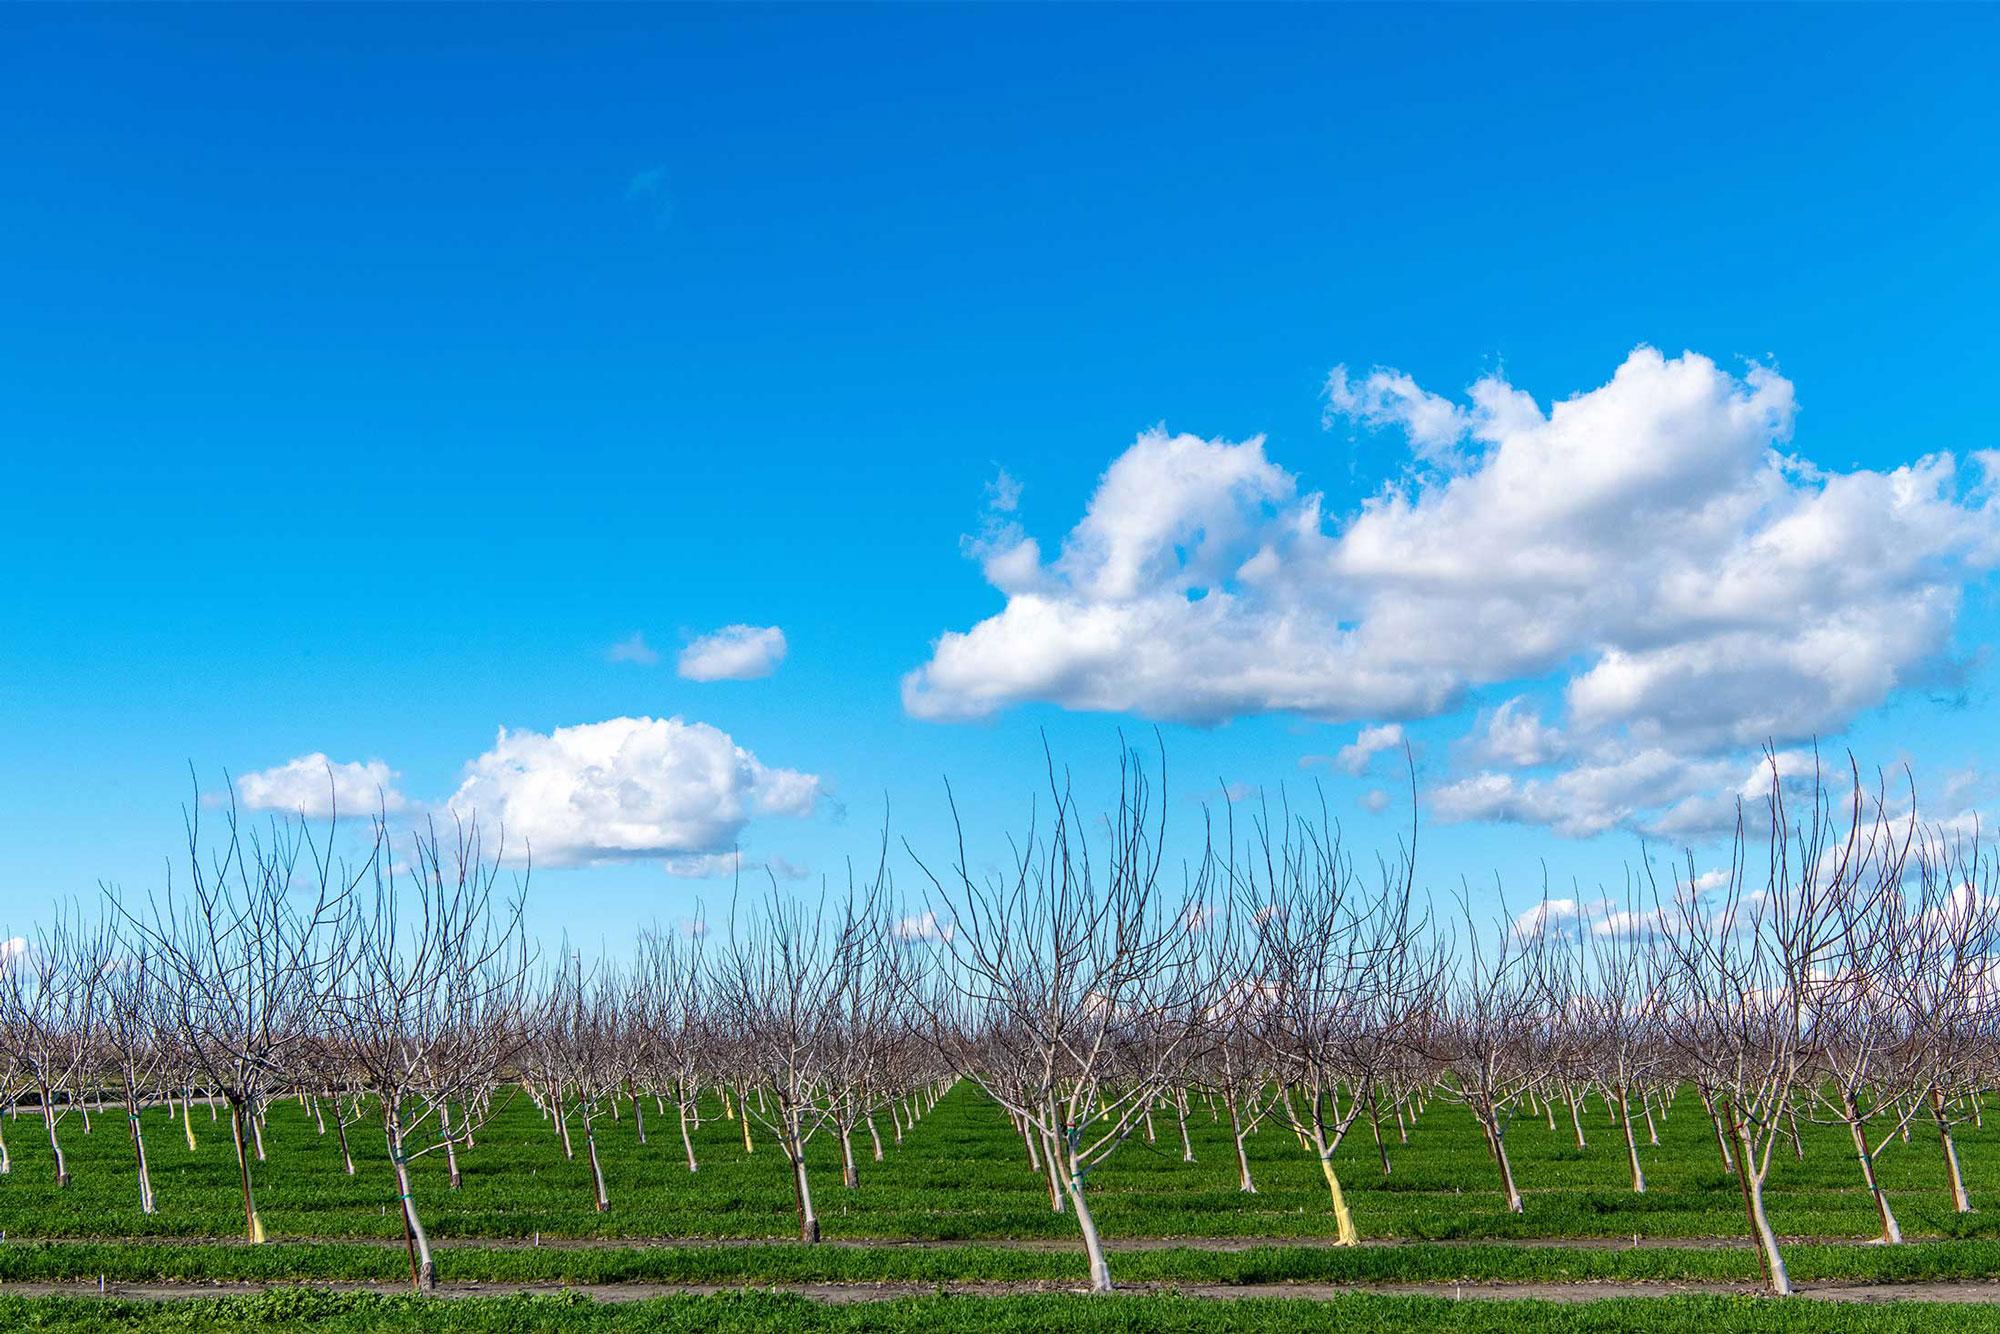 photo - Dormant Walnut Orchard in Lodi, California-pixel-ca-dwr-FL_Delta-3954_02_22_2019